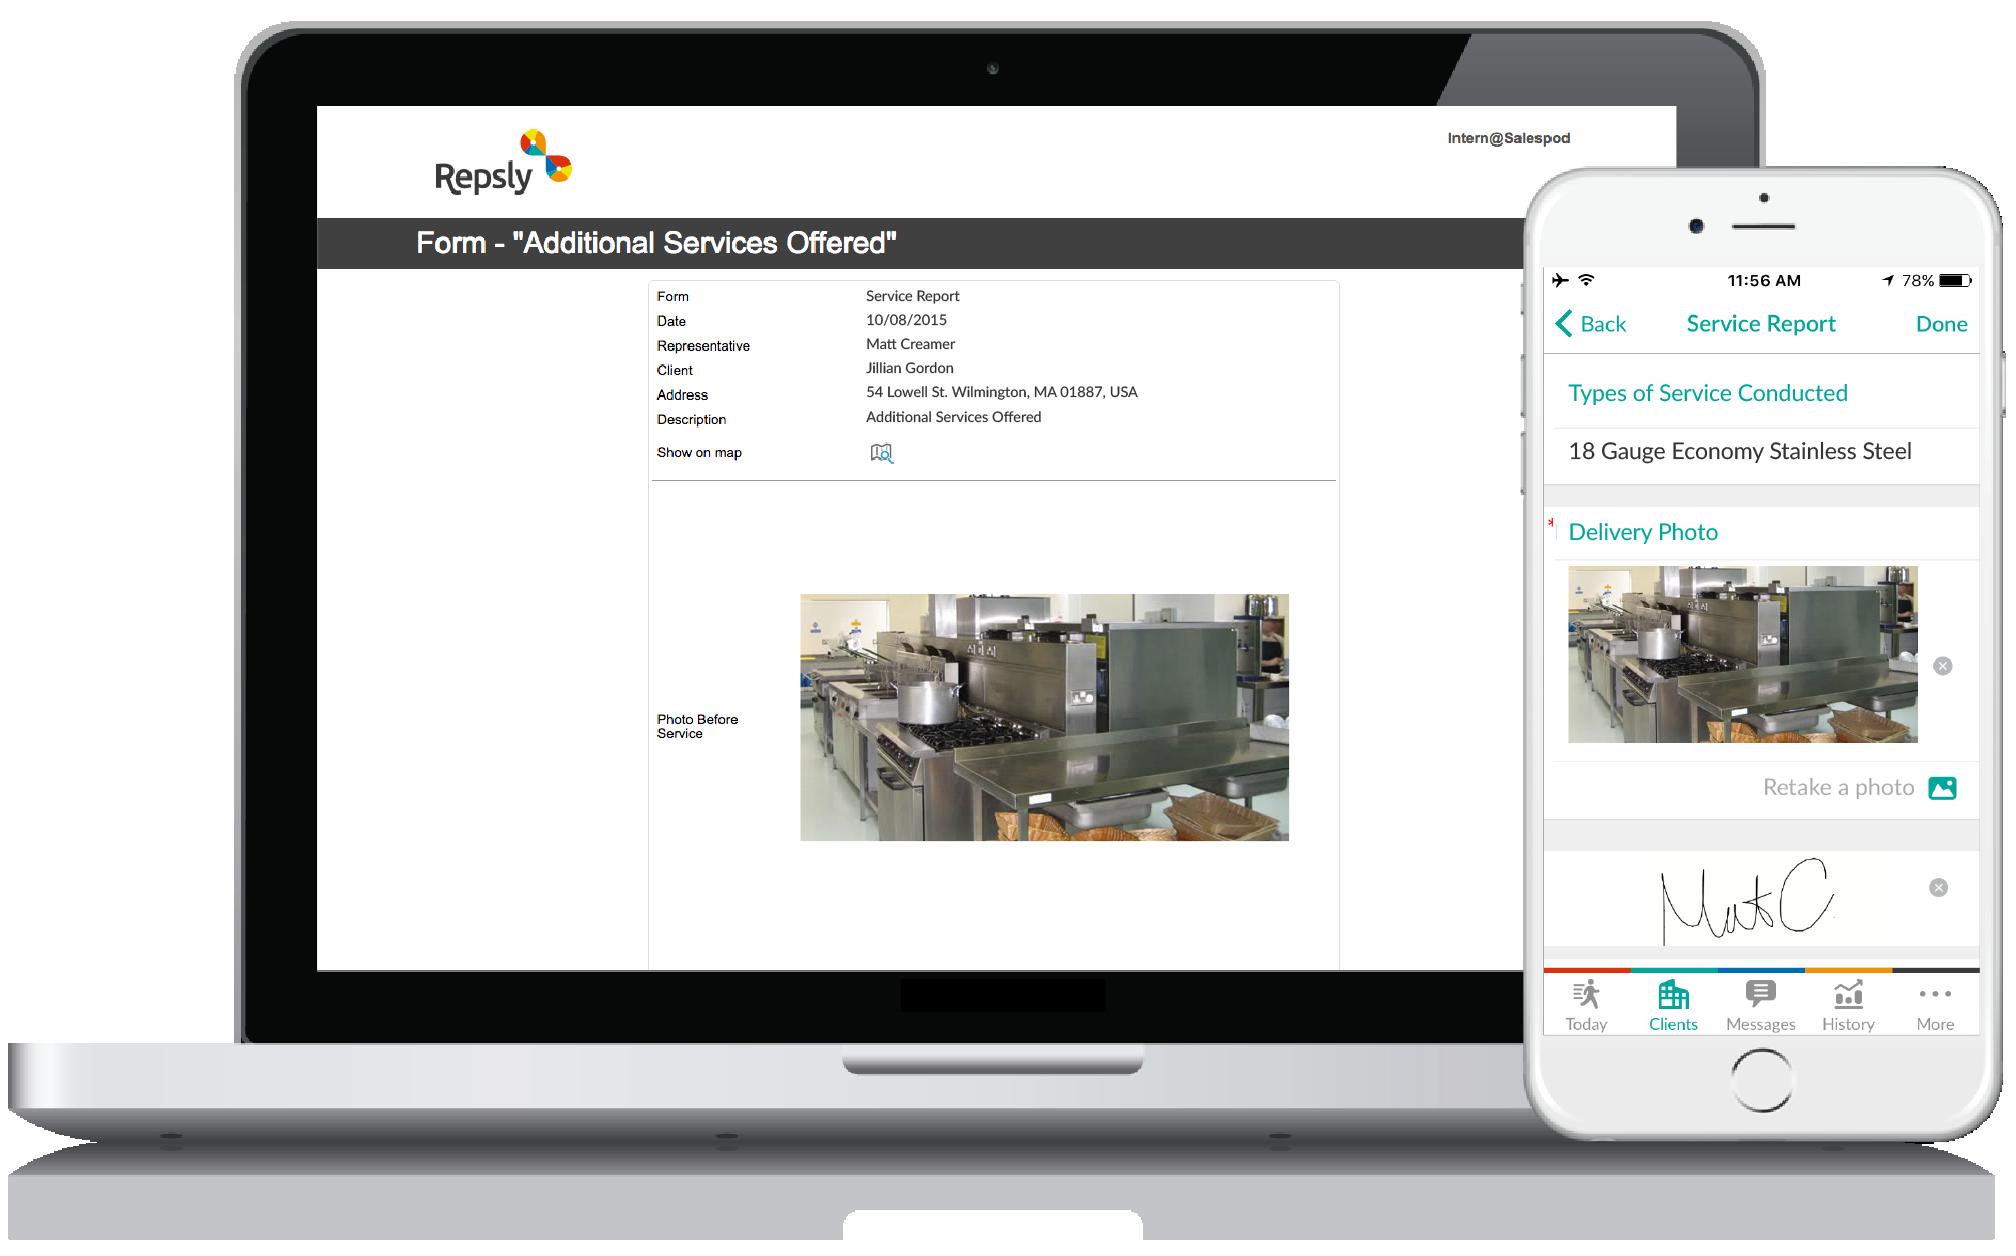 Restaurant Sales Software Mobile forms